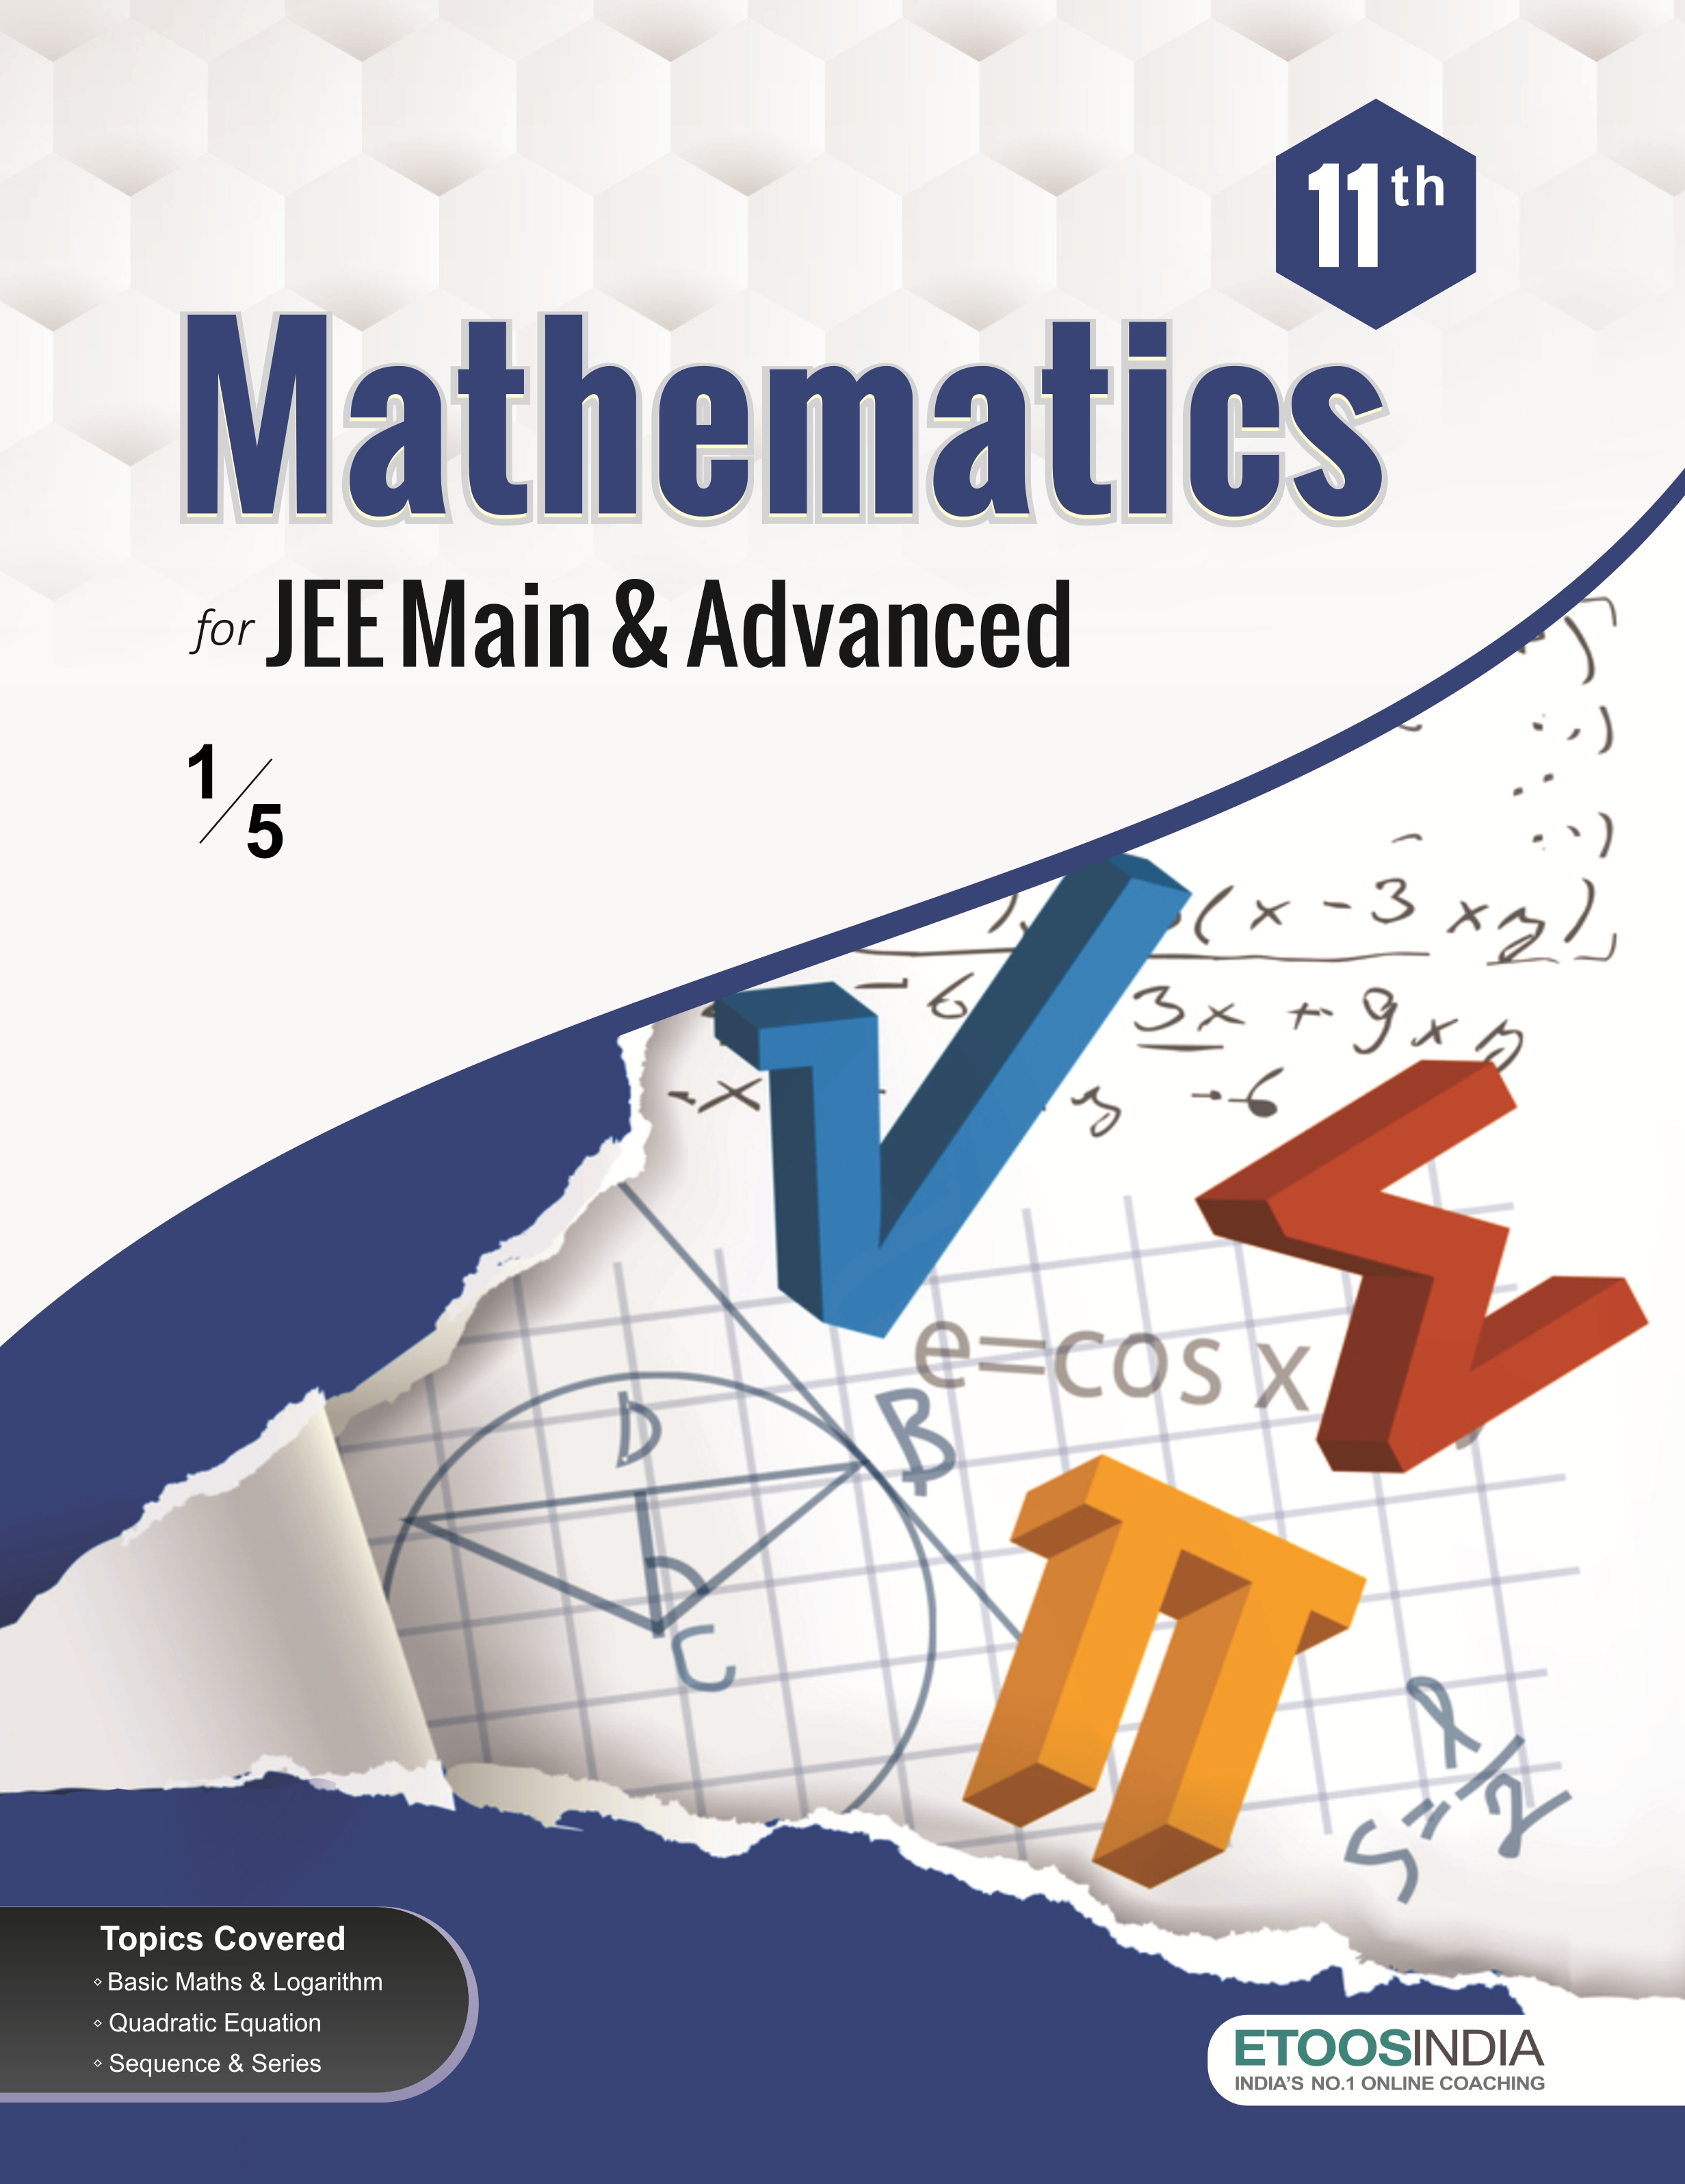 Best Books for NEET, IIT JEE Mains and Advanced Preparation | Etoosindia